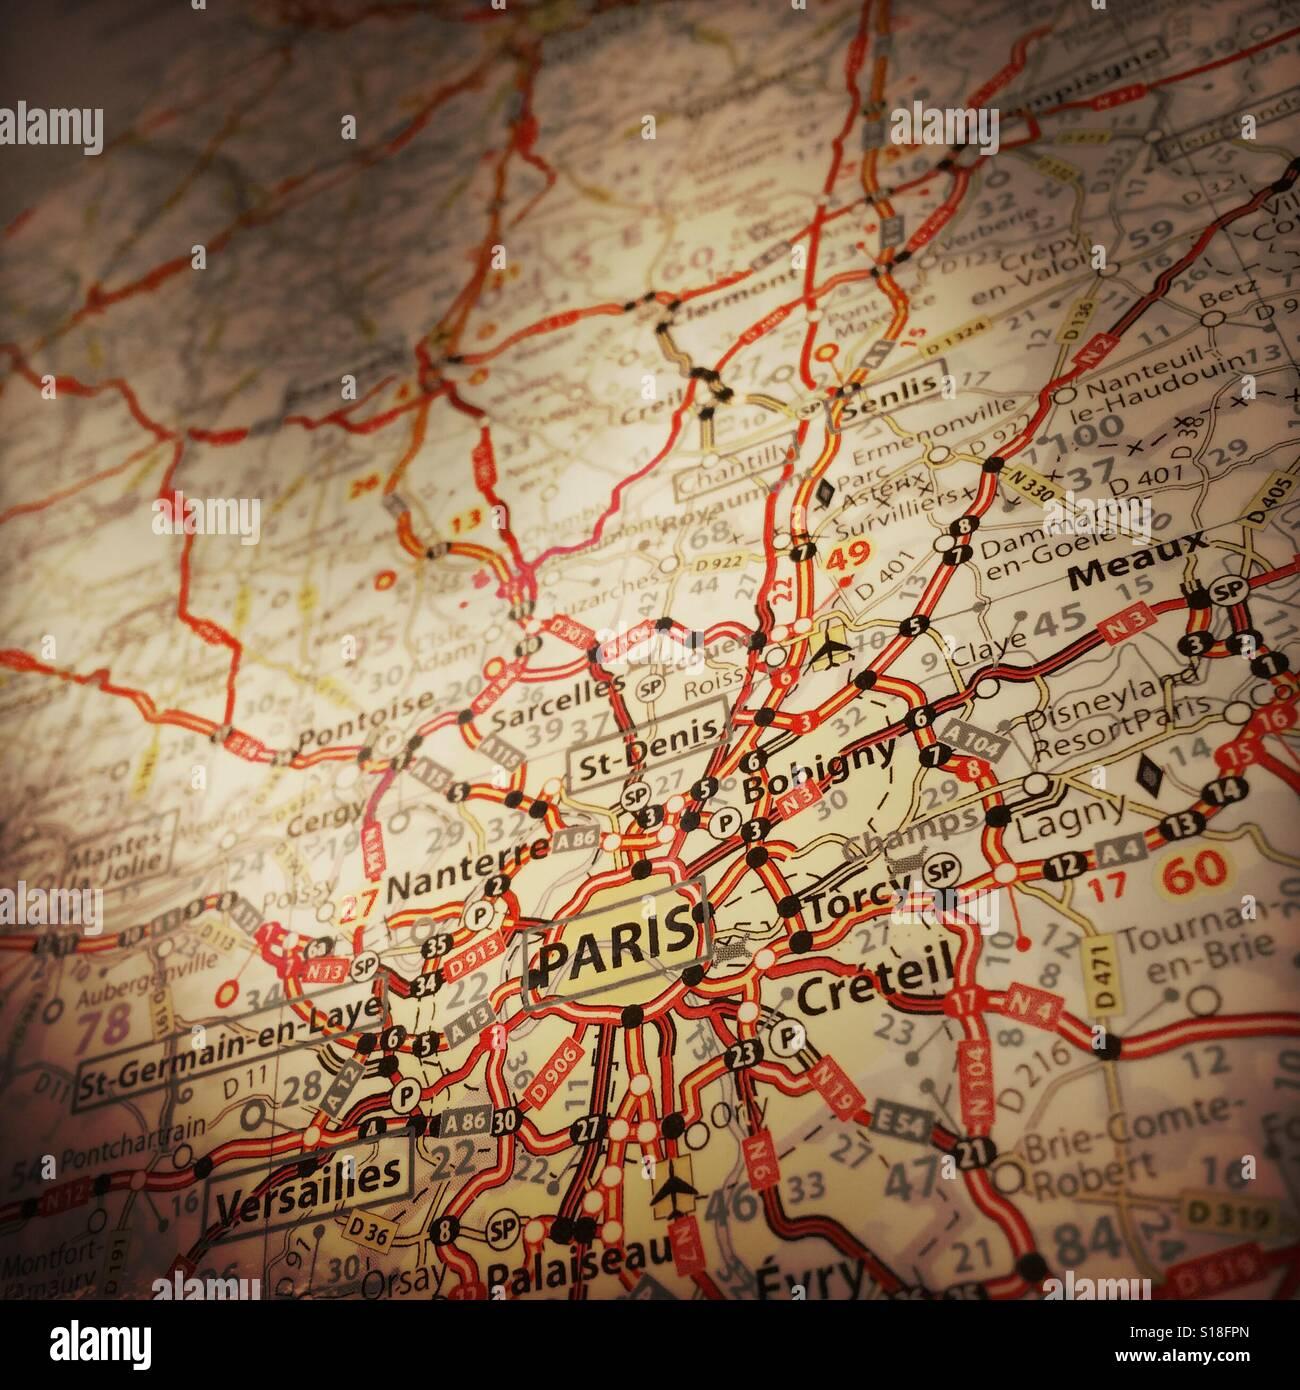 Map Of France Showing Paris.Map Showing Paris France Stock Photo 310589293 Alamy